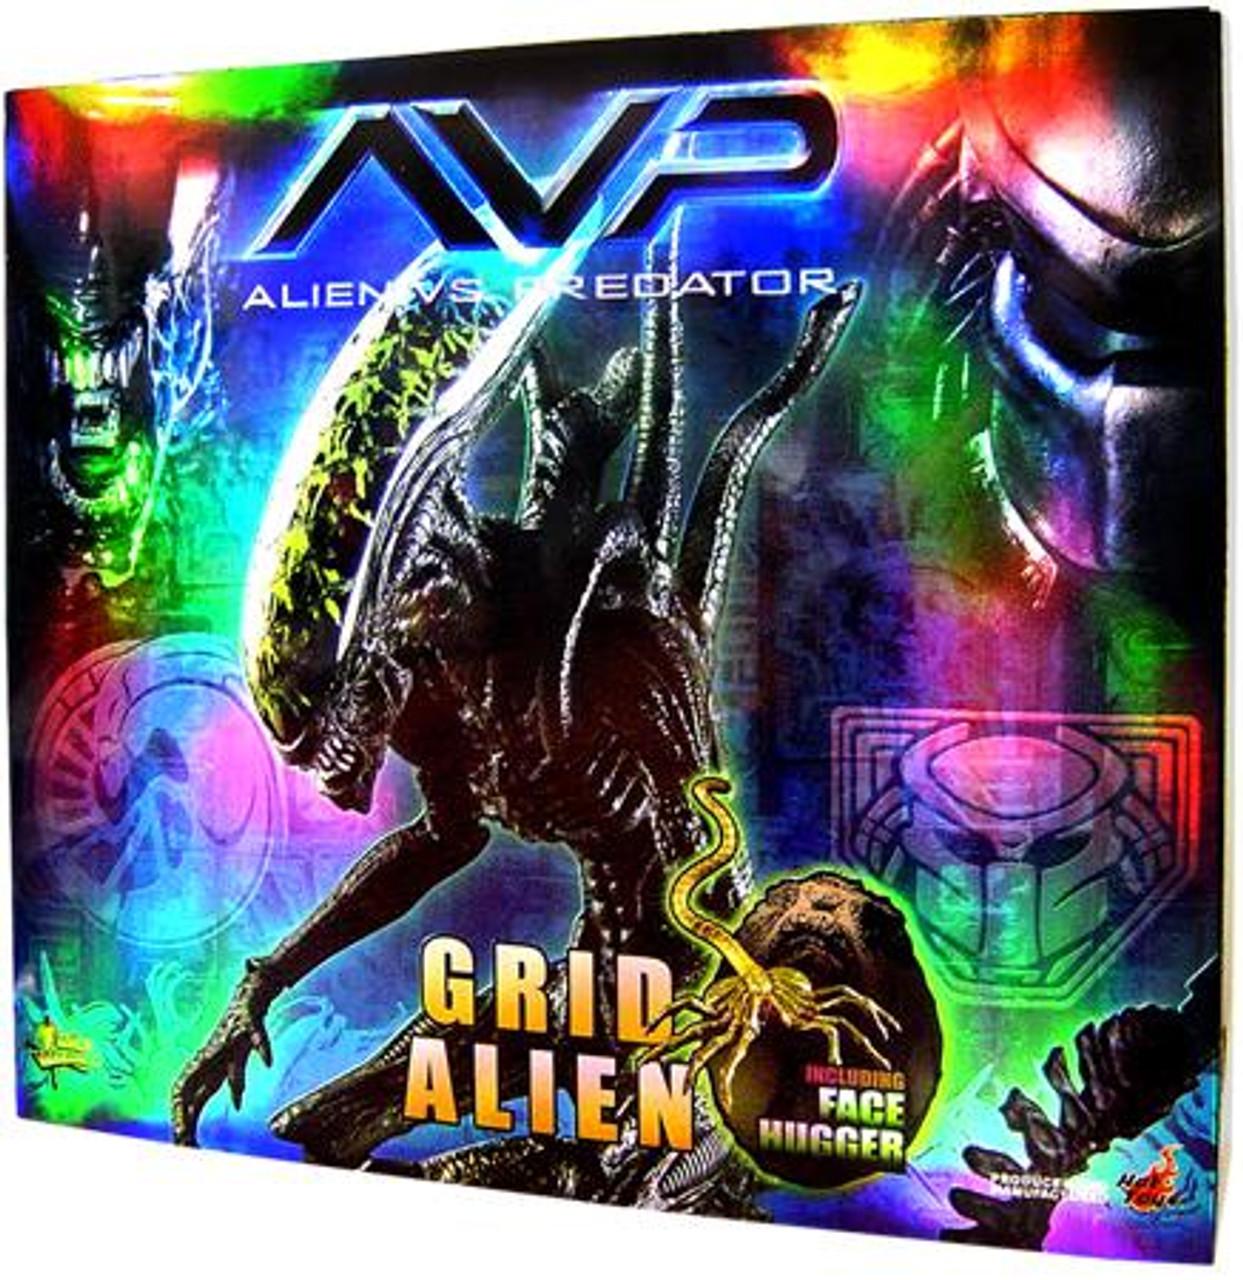 Alien vs Predator Movie Masterpiece Grid Alien with Facehugger Exclusive 1/6 Collectible Figure